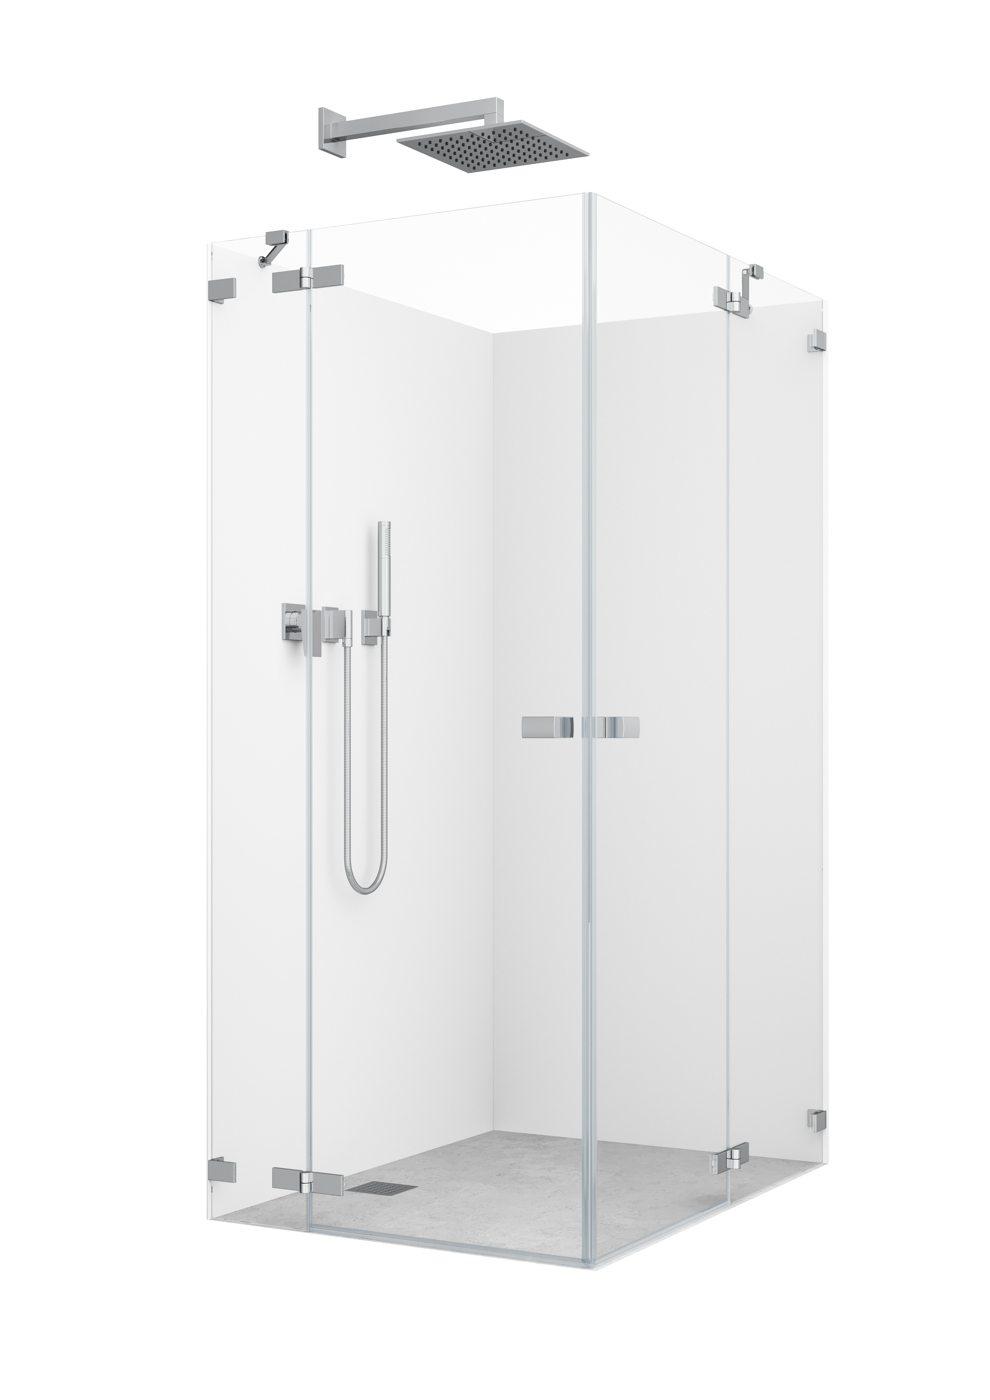 Kabina prysznicowa CORONE marki Aquante